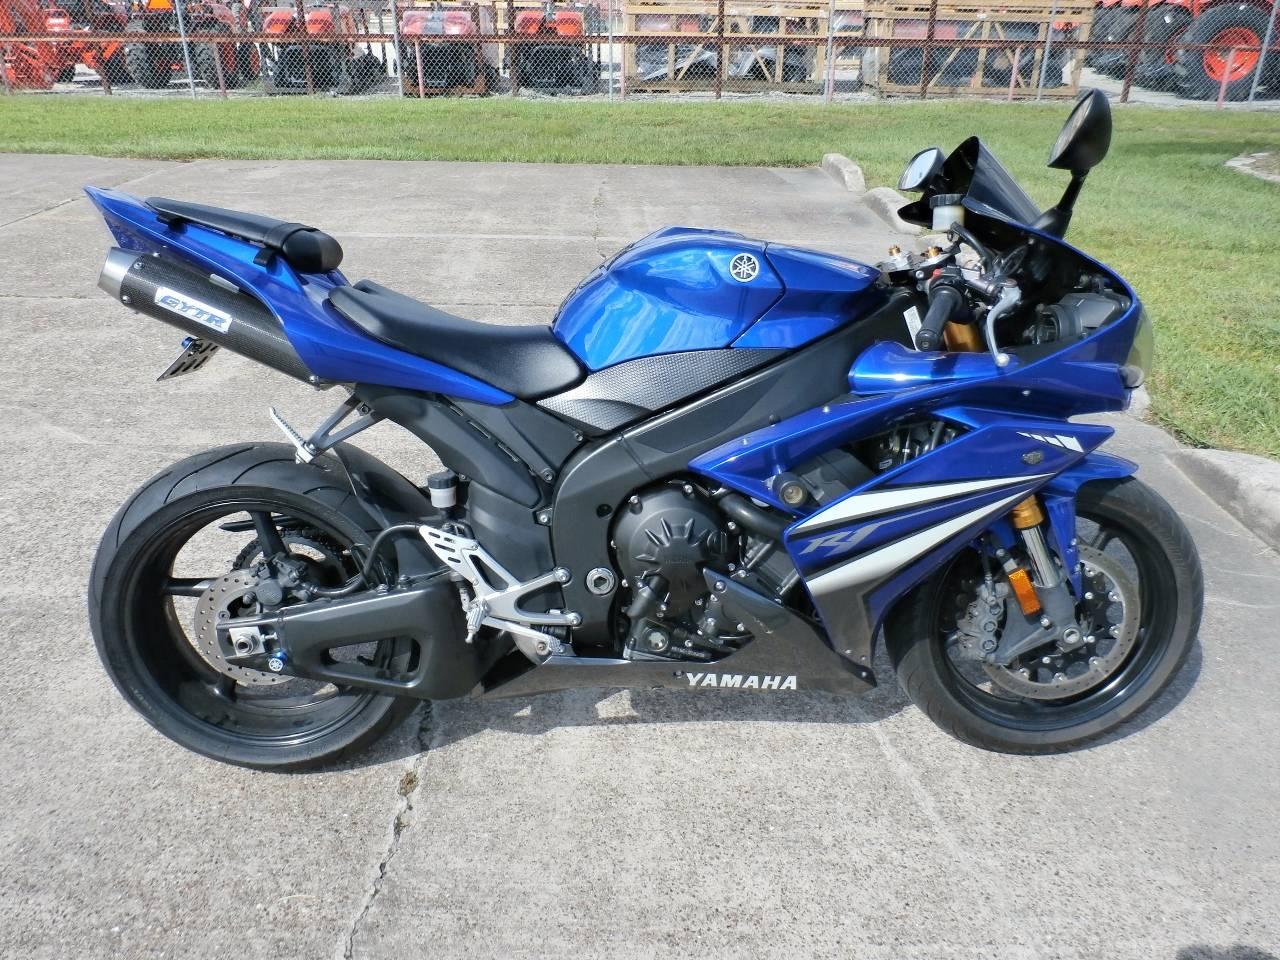 2007 Yamaha YZF-R1 for sale 25046